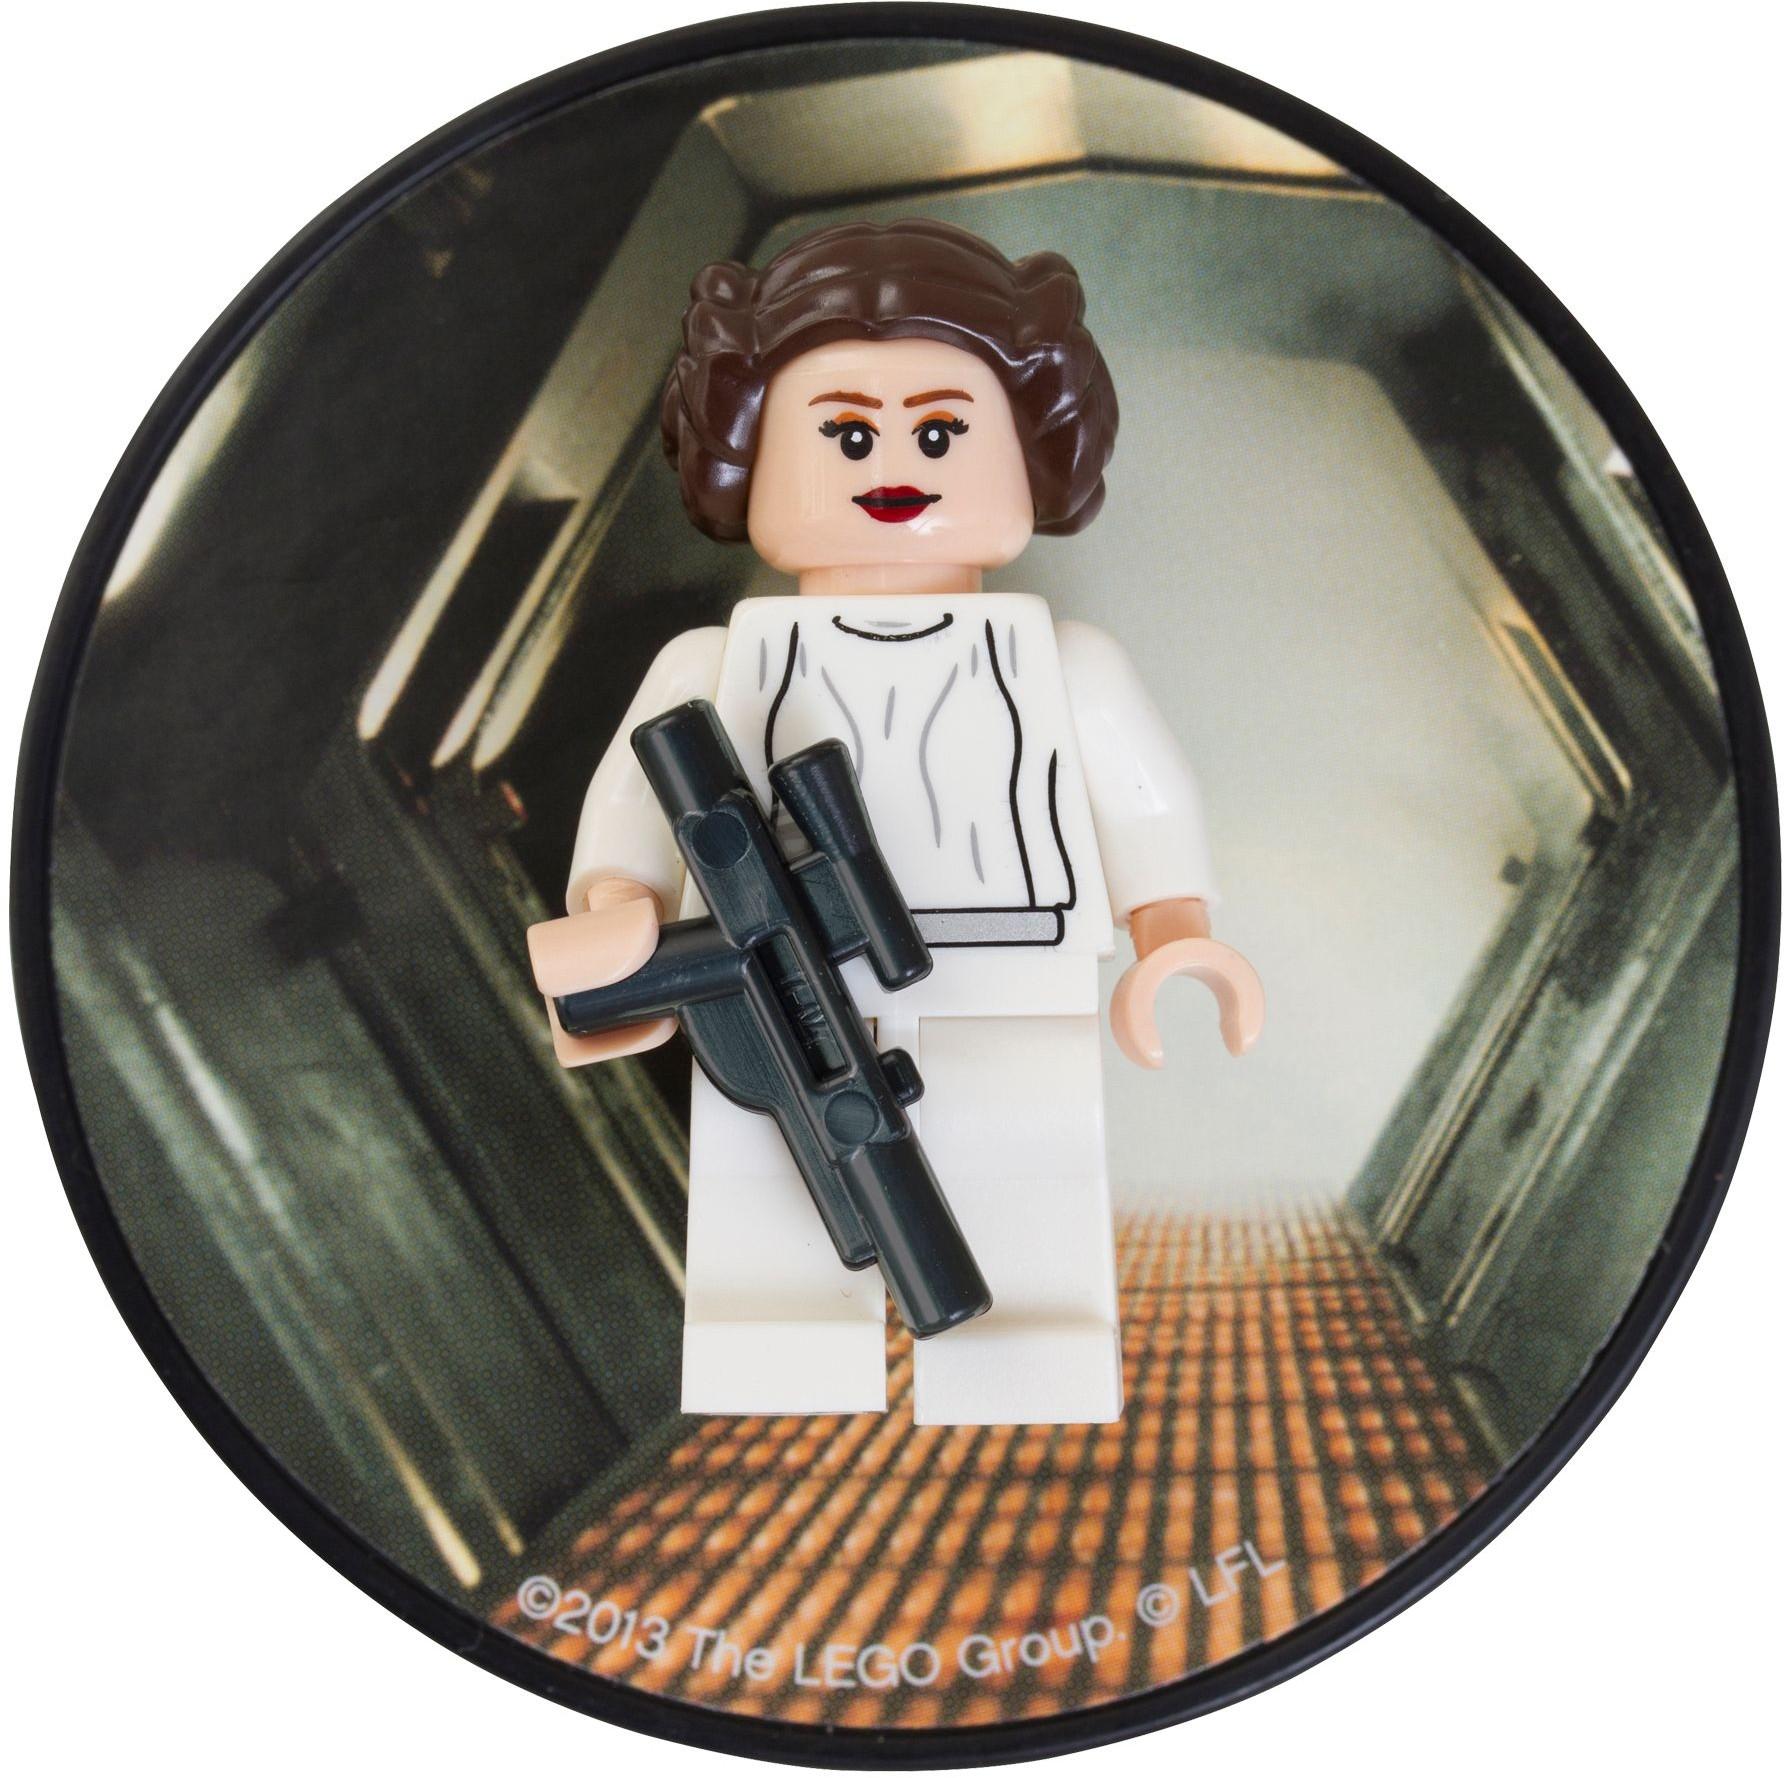 LEGO star wars figurine-obi wan kenobi 322 852554